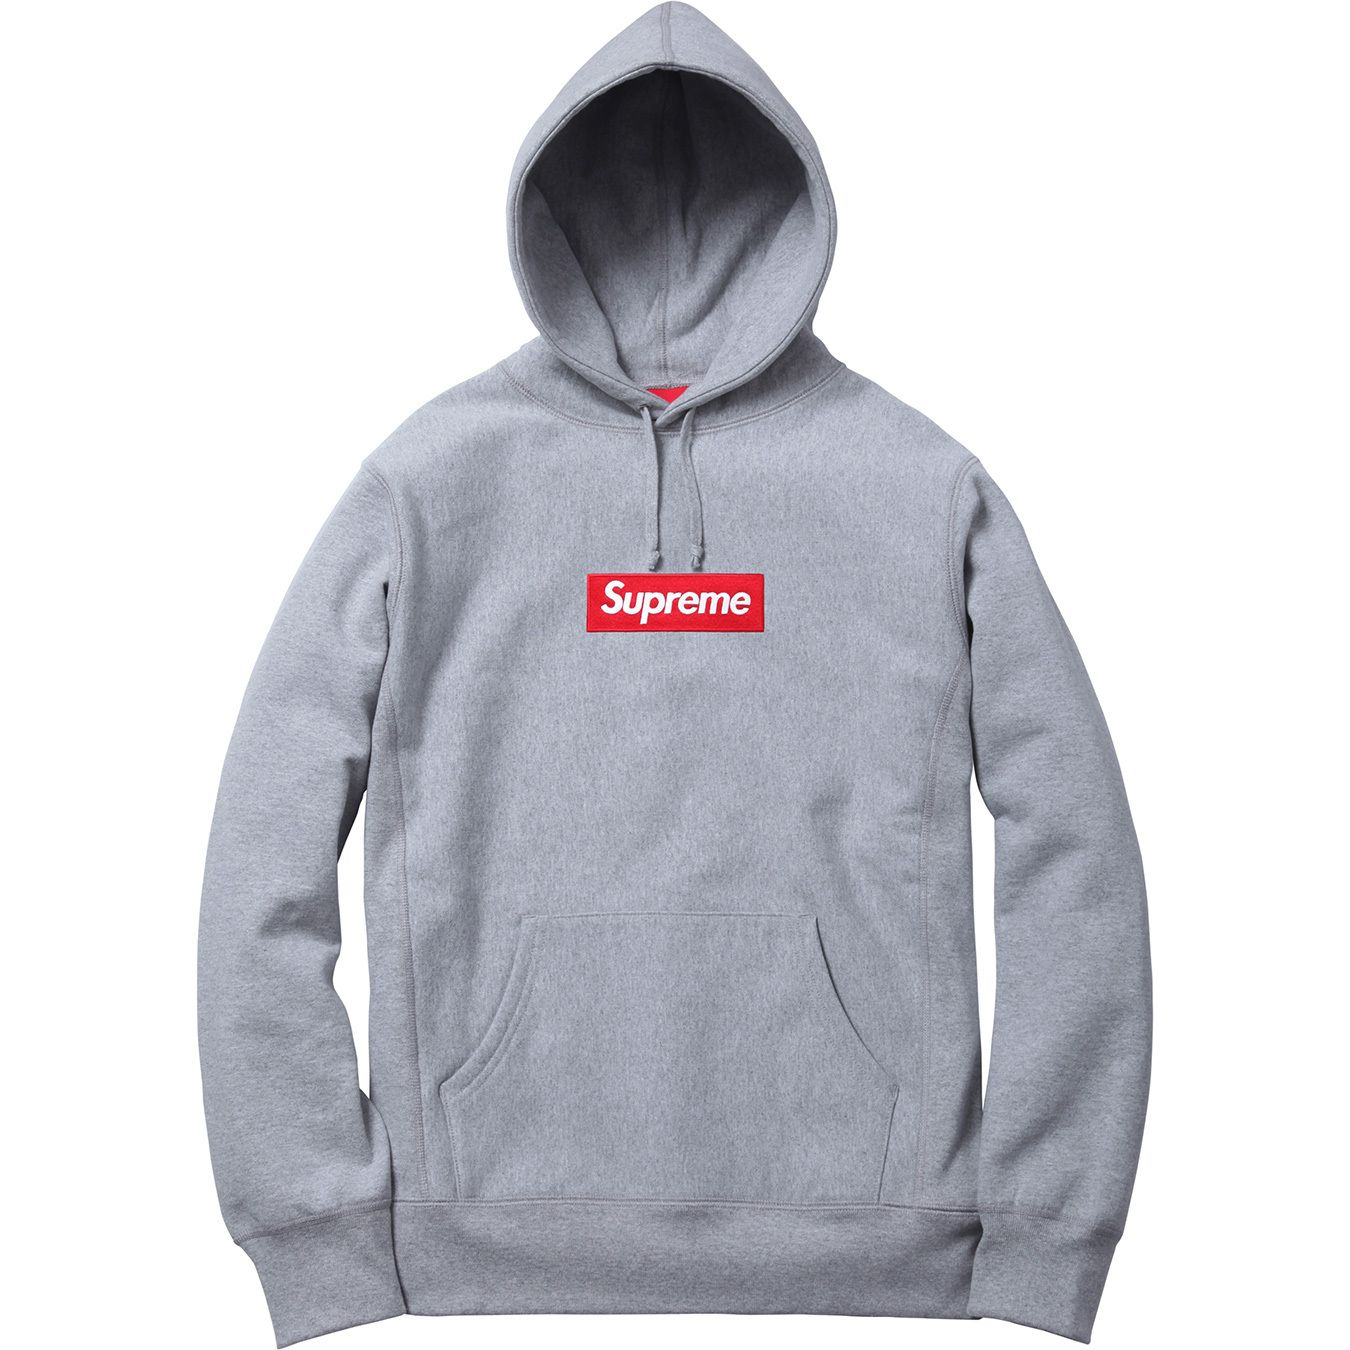 Supreme - Box Logo Pullover Hoodies